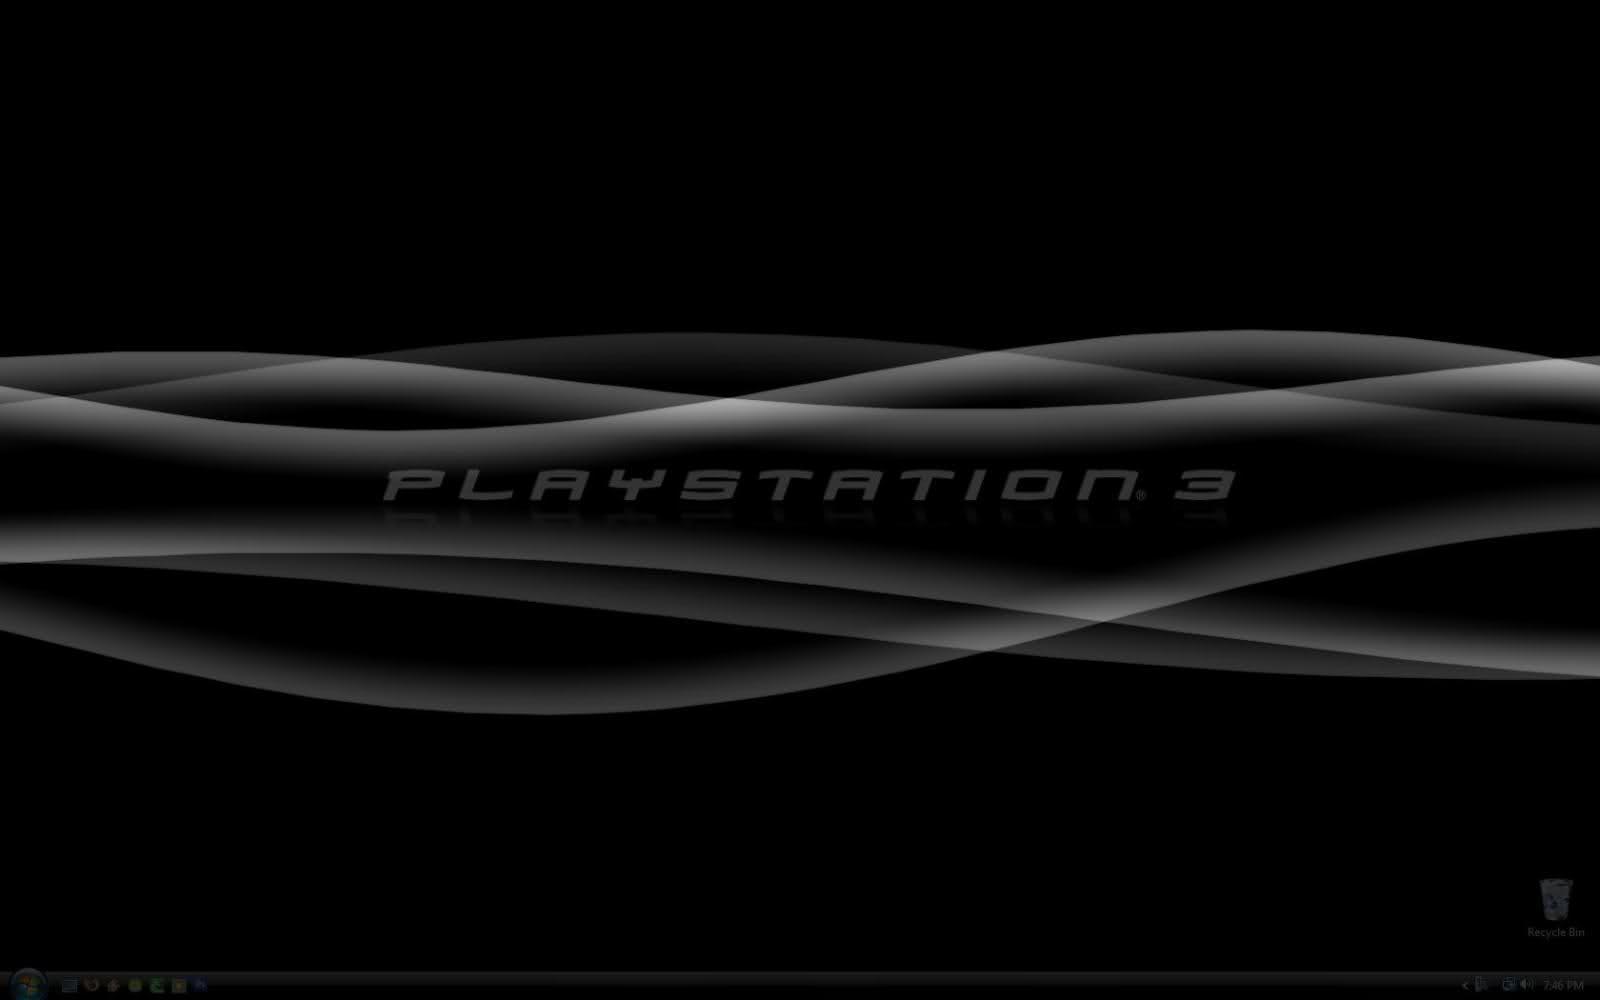 PS3 CODiNG